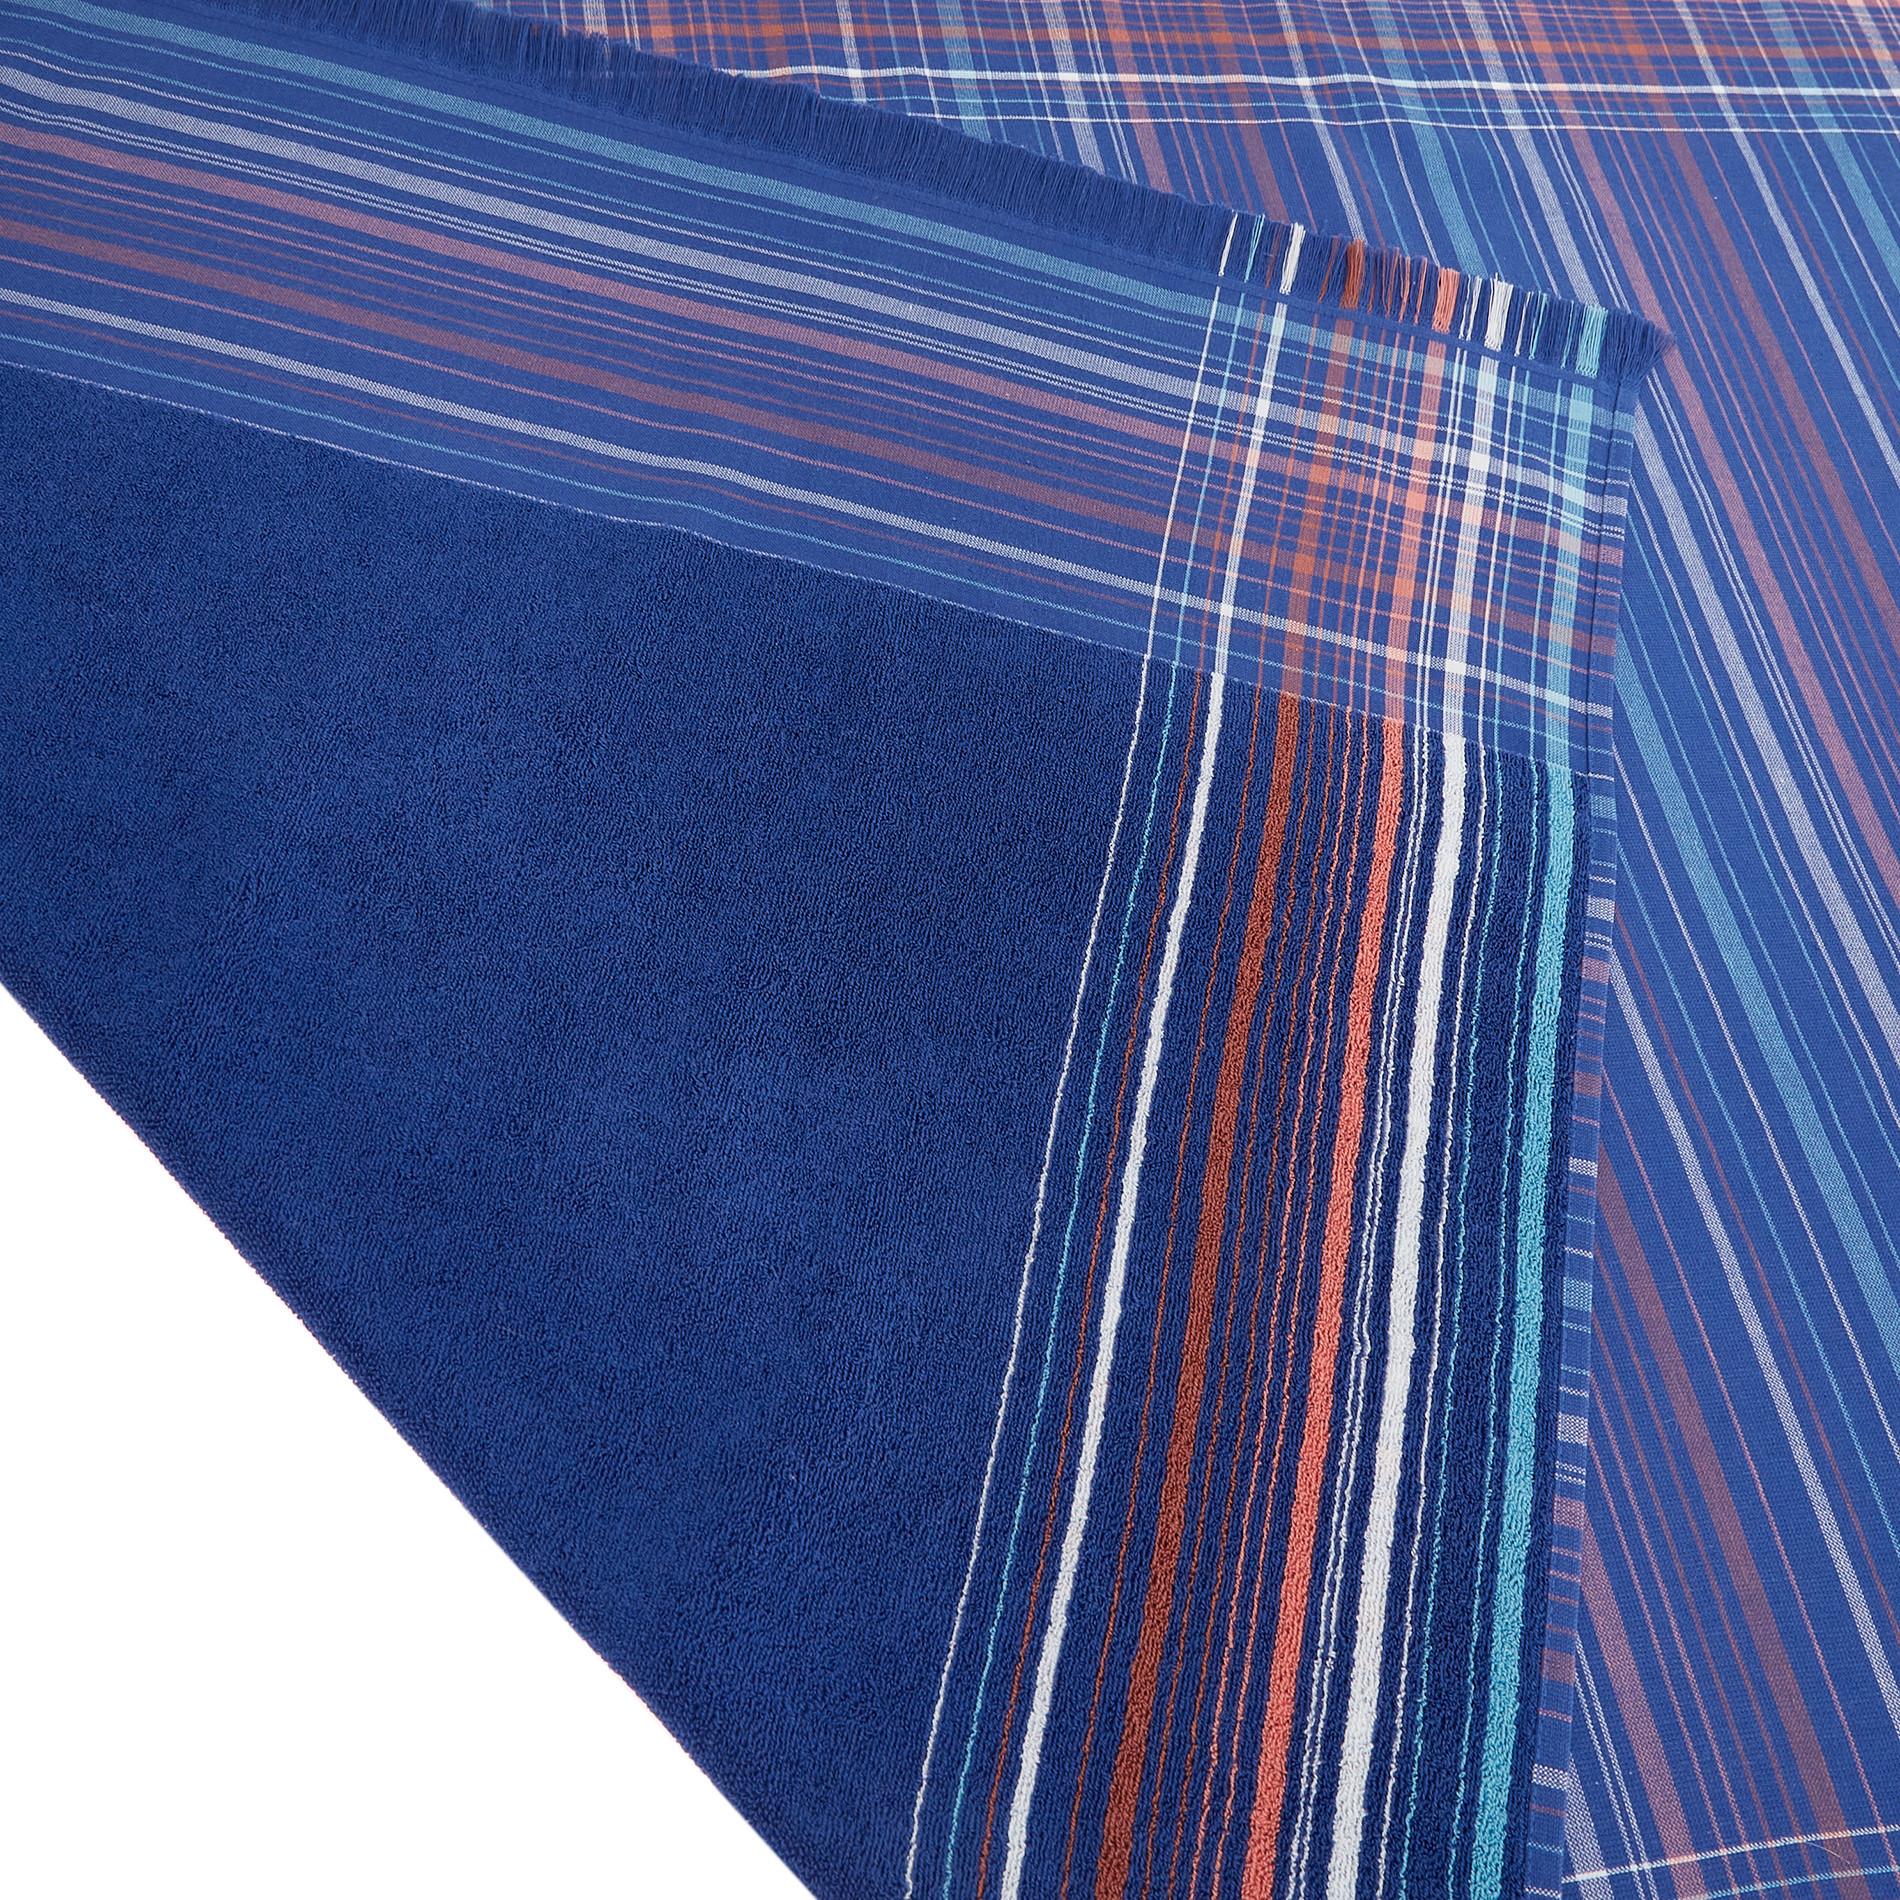 Telo mare hammam cotone tinto filo a righe, Blu, large image number 1